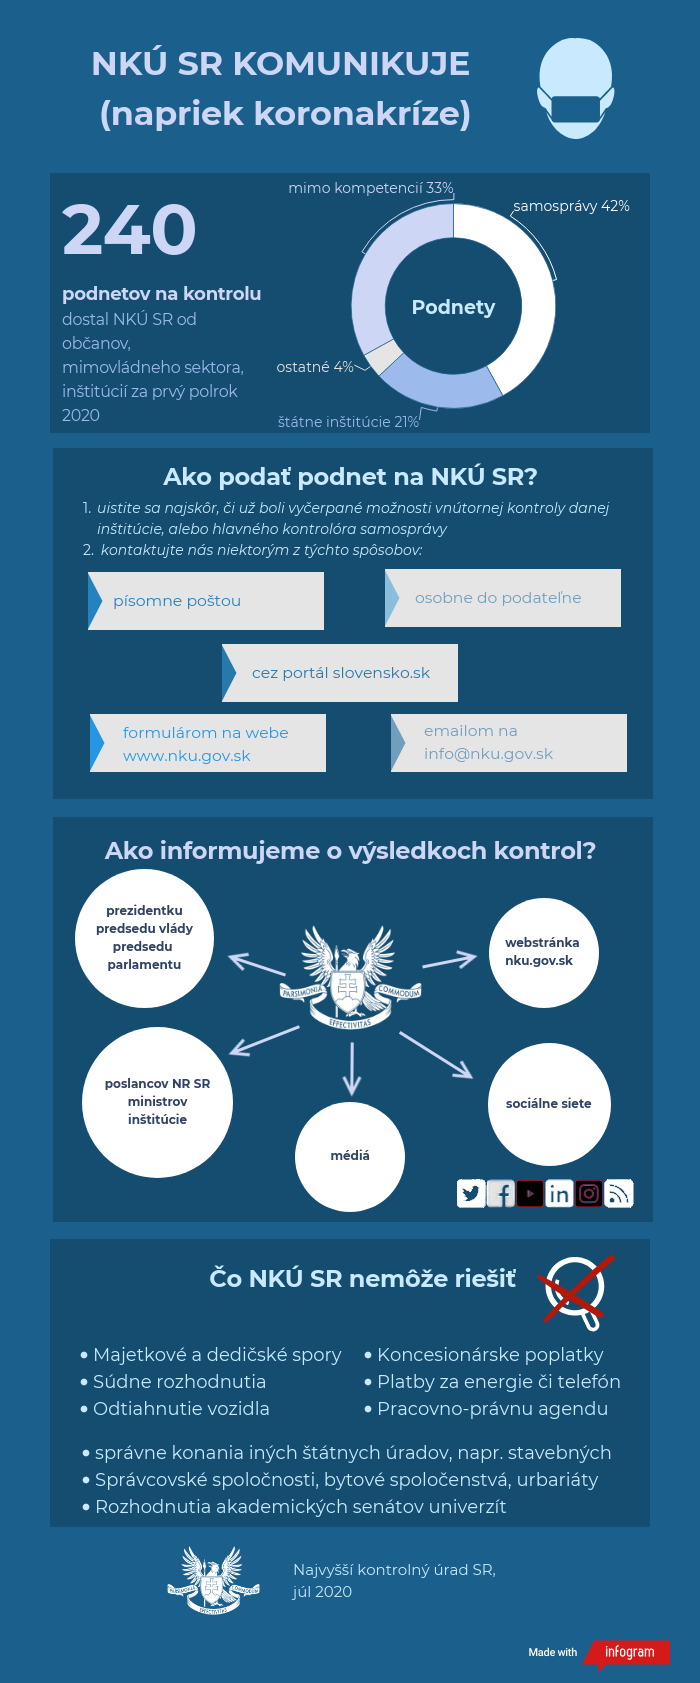 Infografika NKÚ SR komunikuje napriek koronakríze